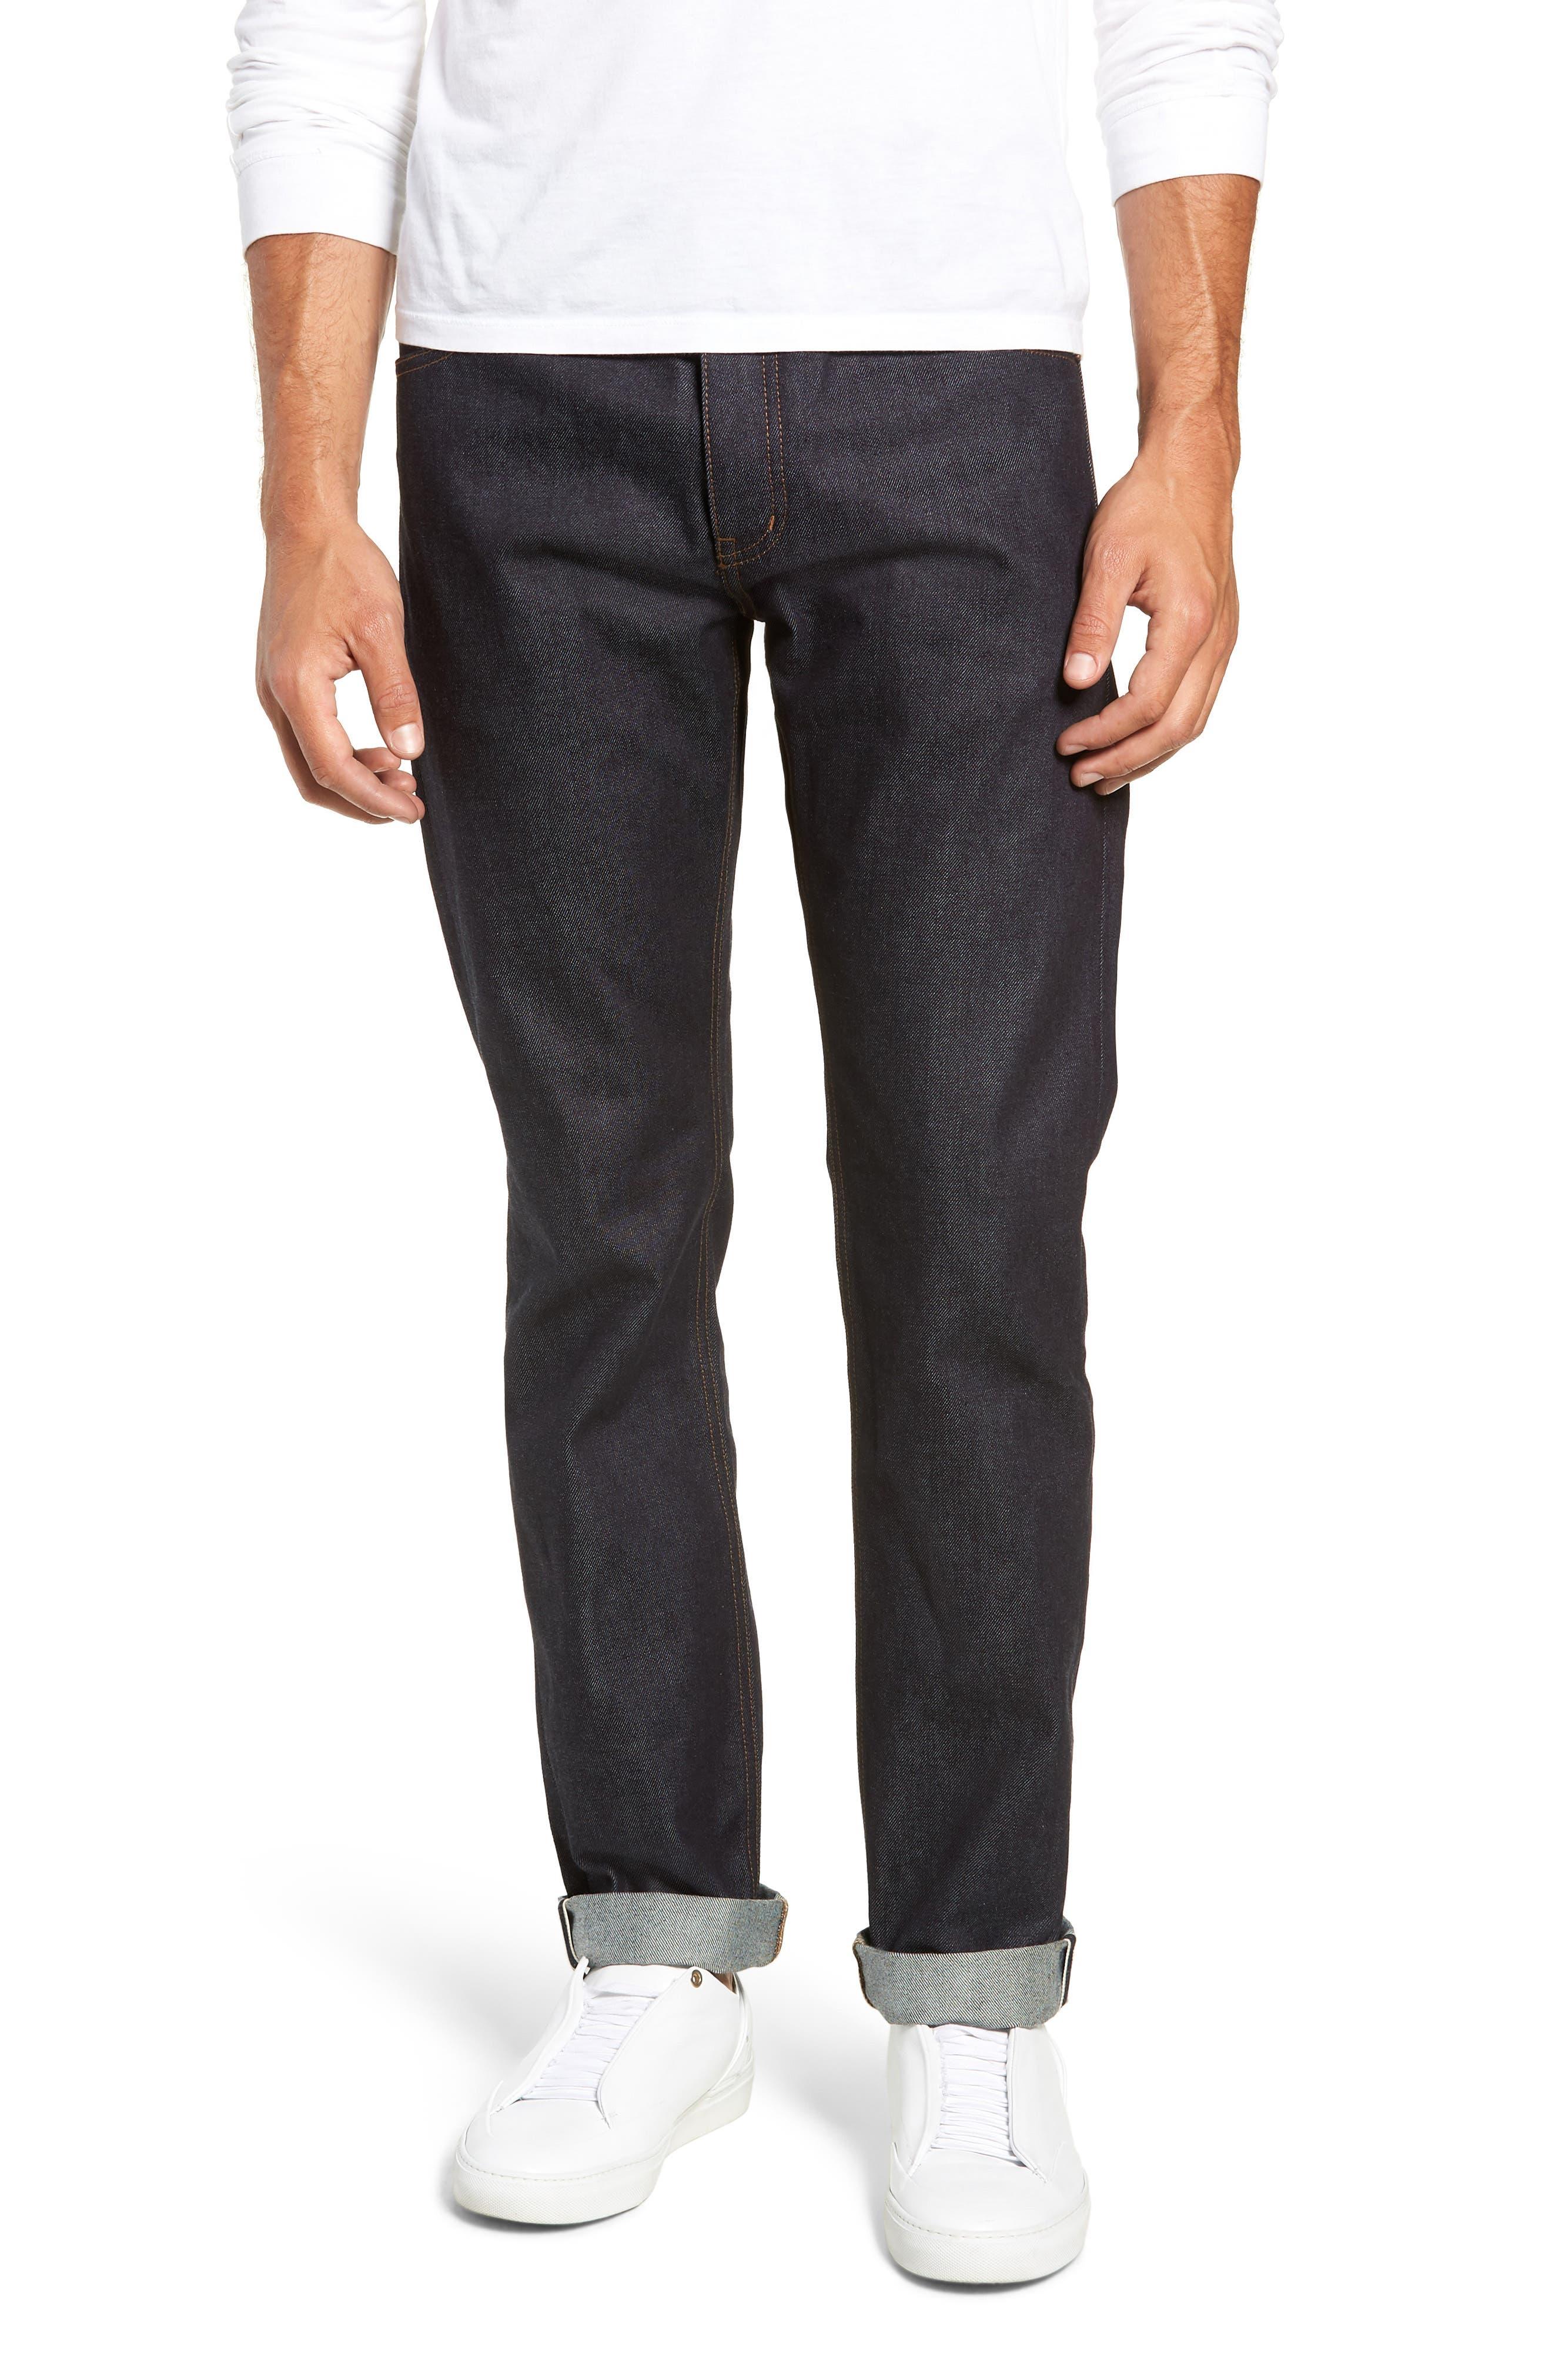 Dr. Denim Jeansmaker Gus Slim Straight Leg Raw Selvedge Jeans,                         Main,                         color, RAW SELVAGE